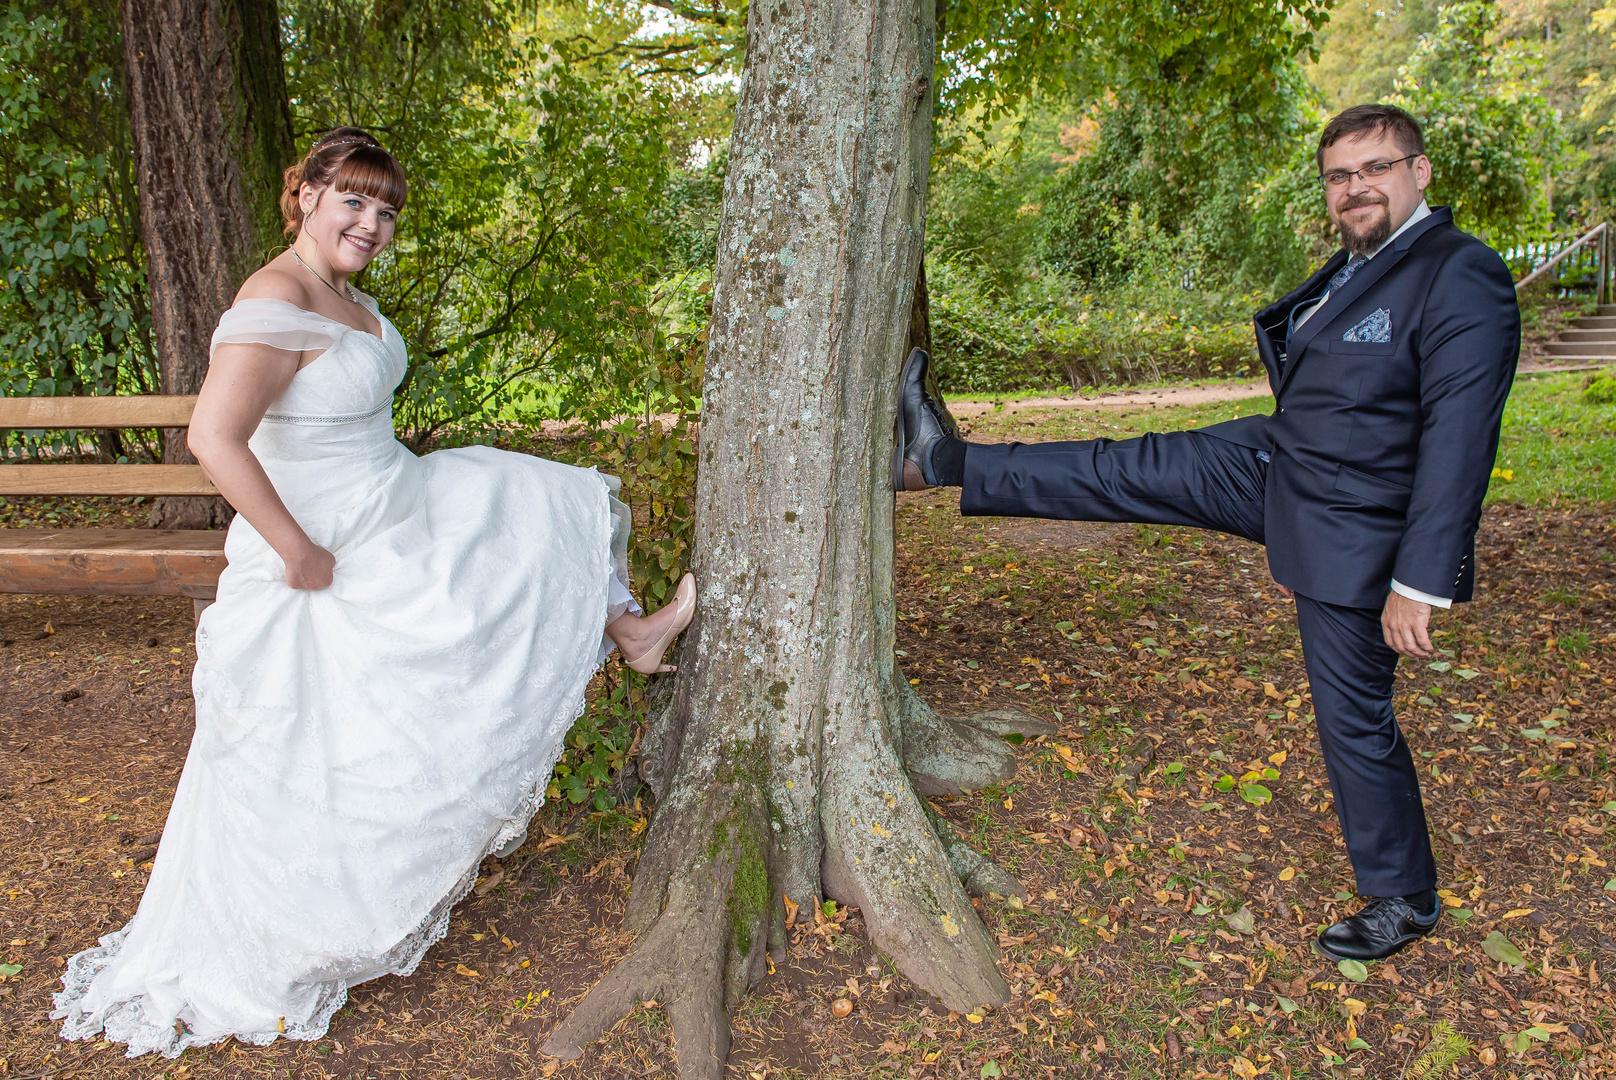 Mr Bean Wedding